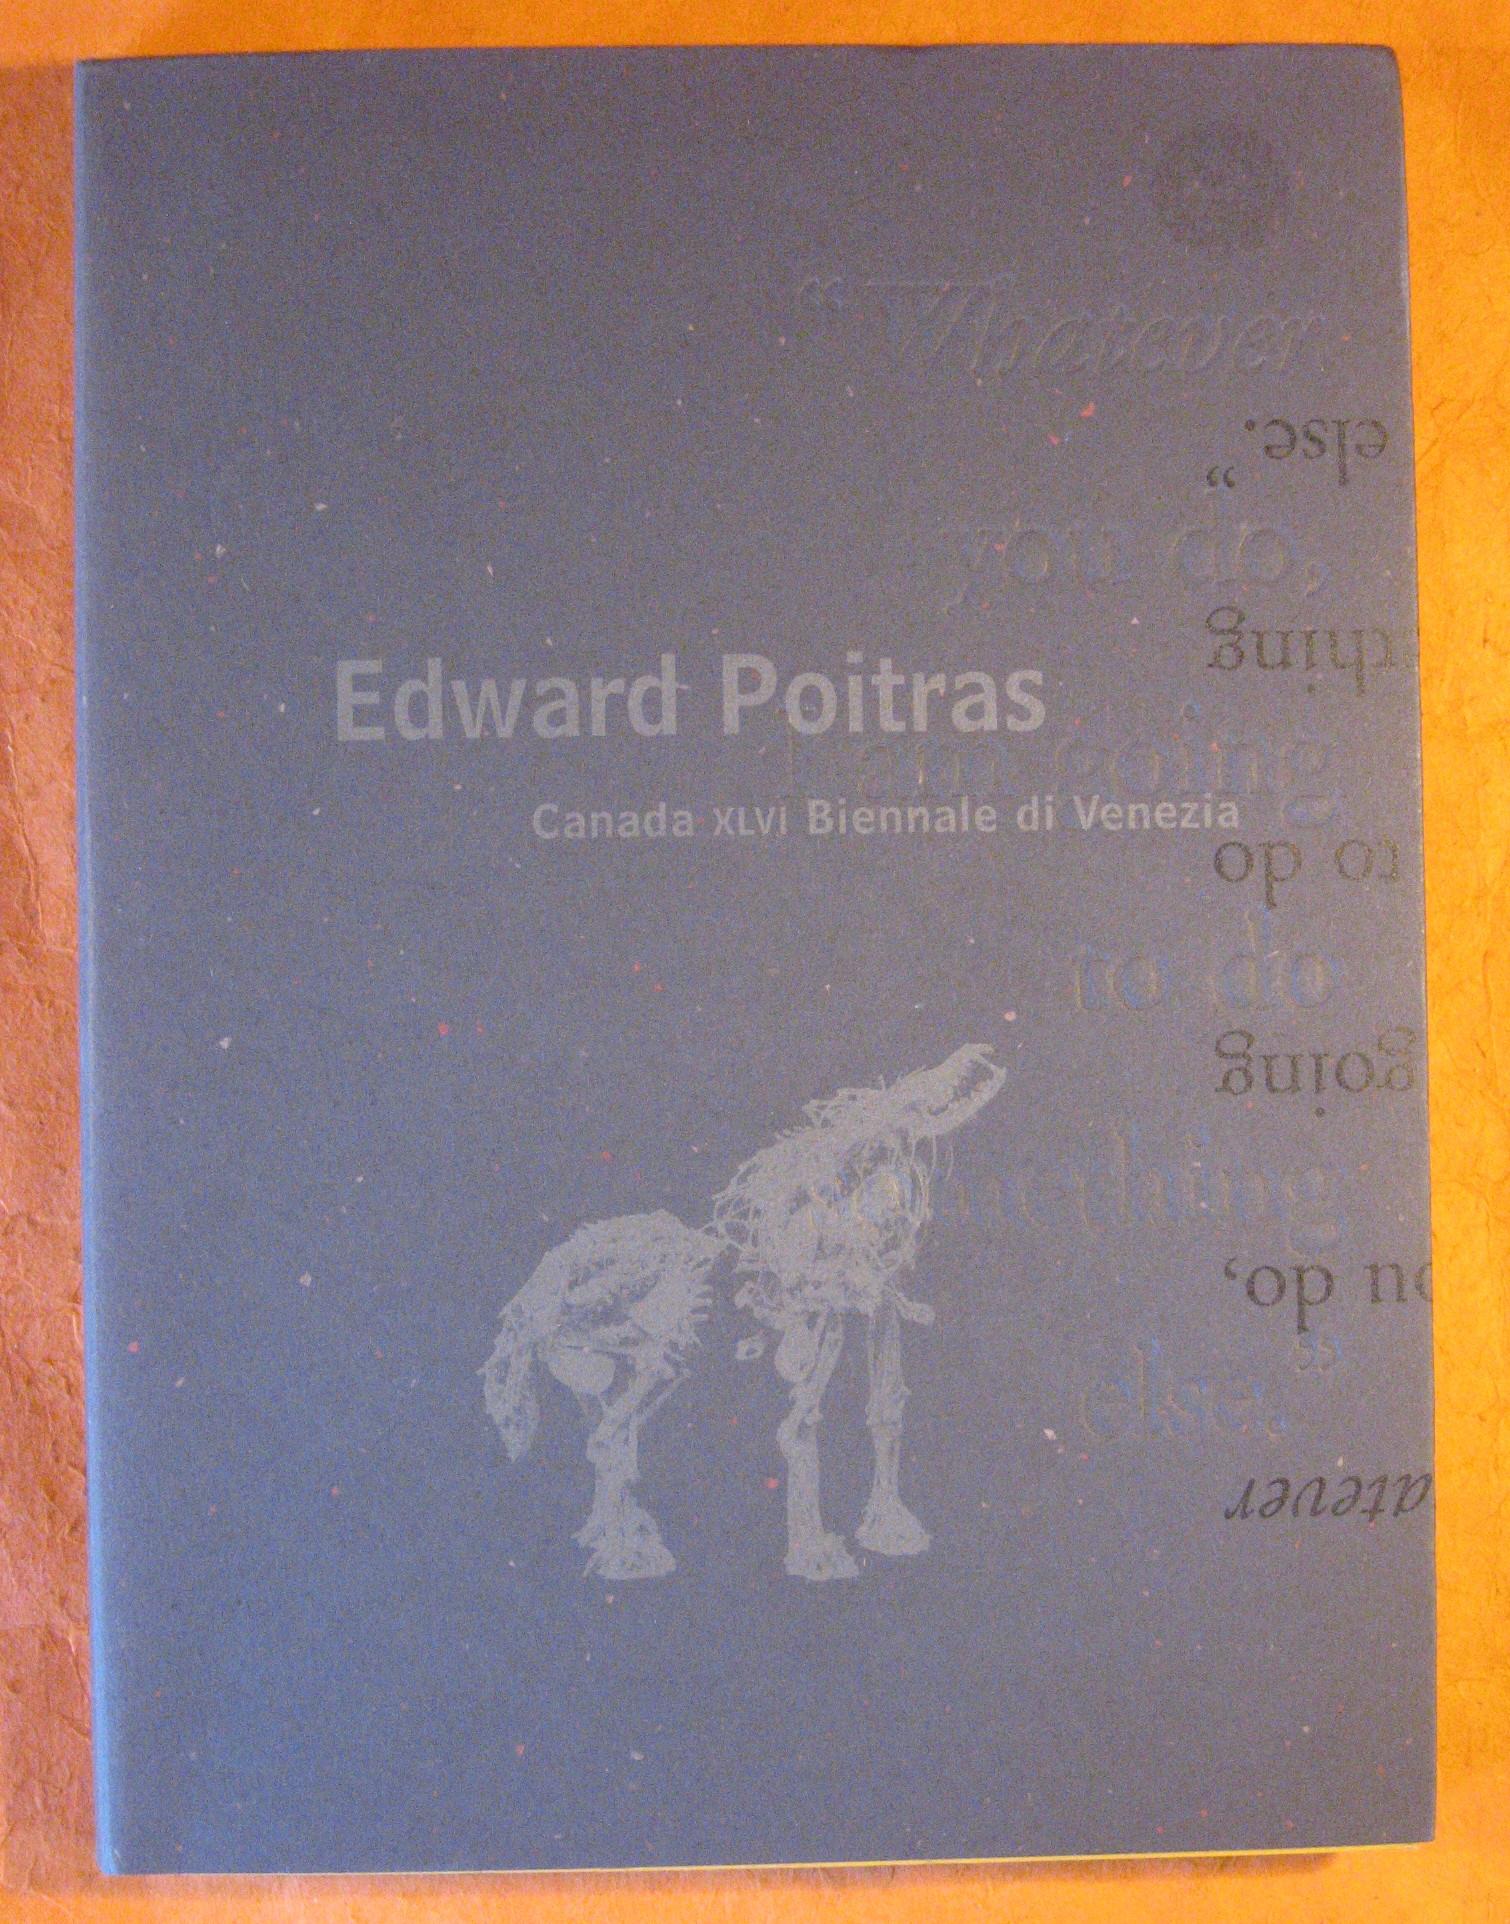 Edward Poitras: Canada XLVI Biennale di Venezia, McMaster, Gerald